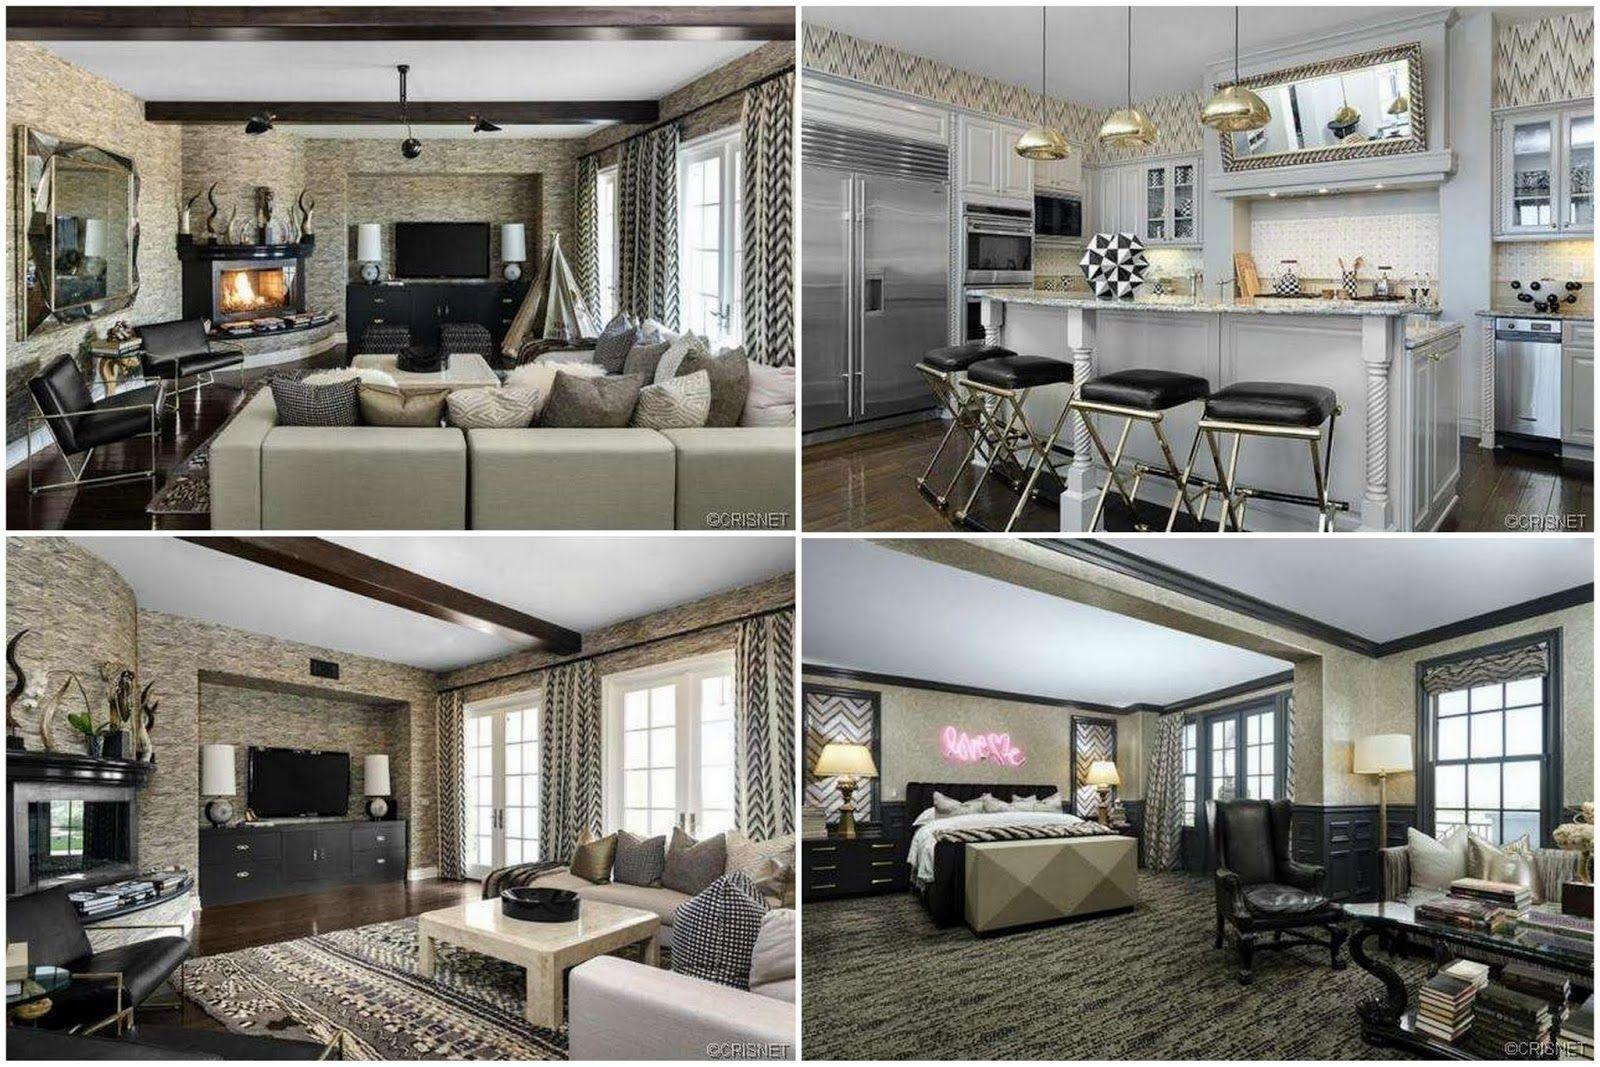 Kourtney Kardashian Home Wohnzimmer Living Room Pinterest - Kourtney kardashian bedroom furniture